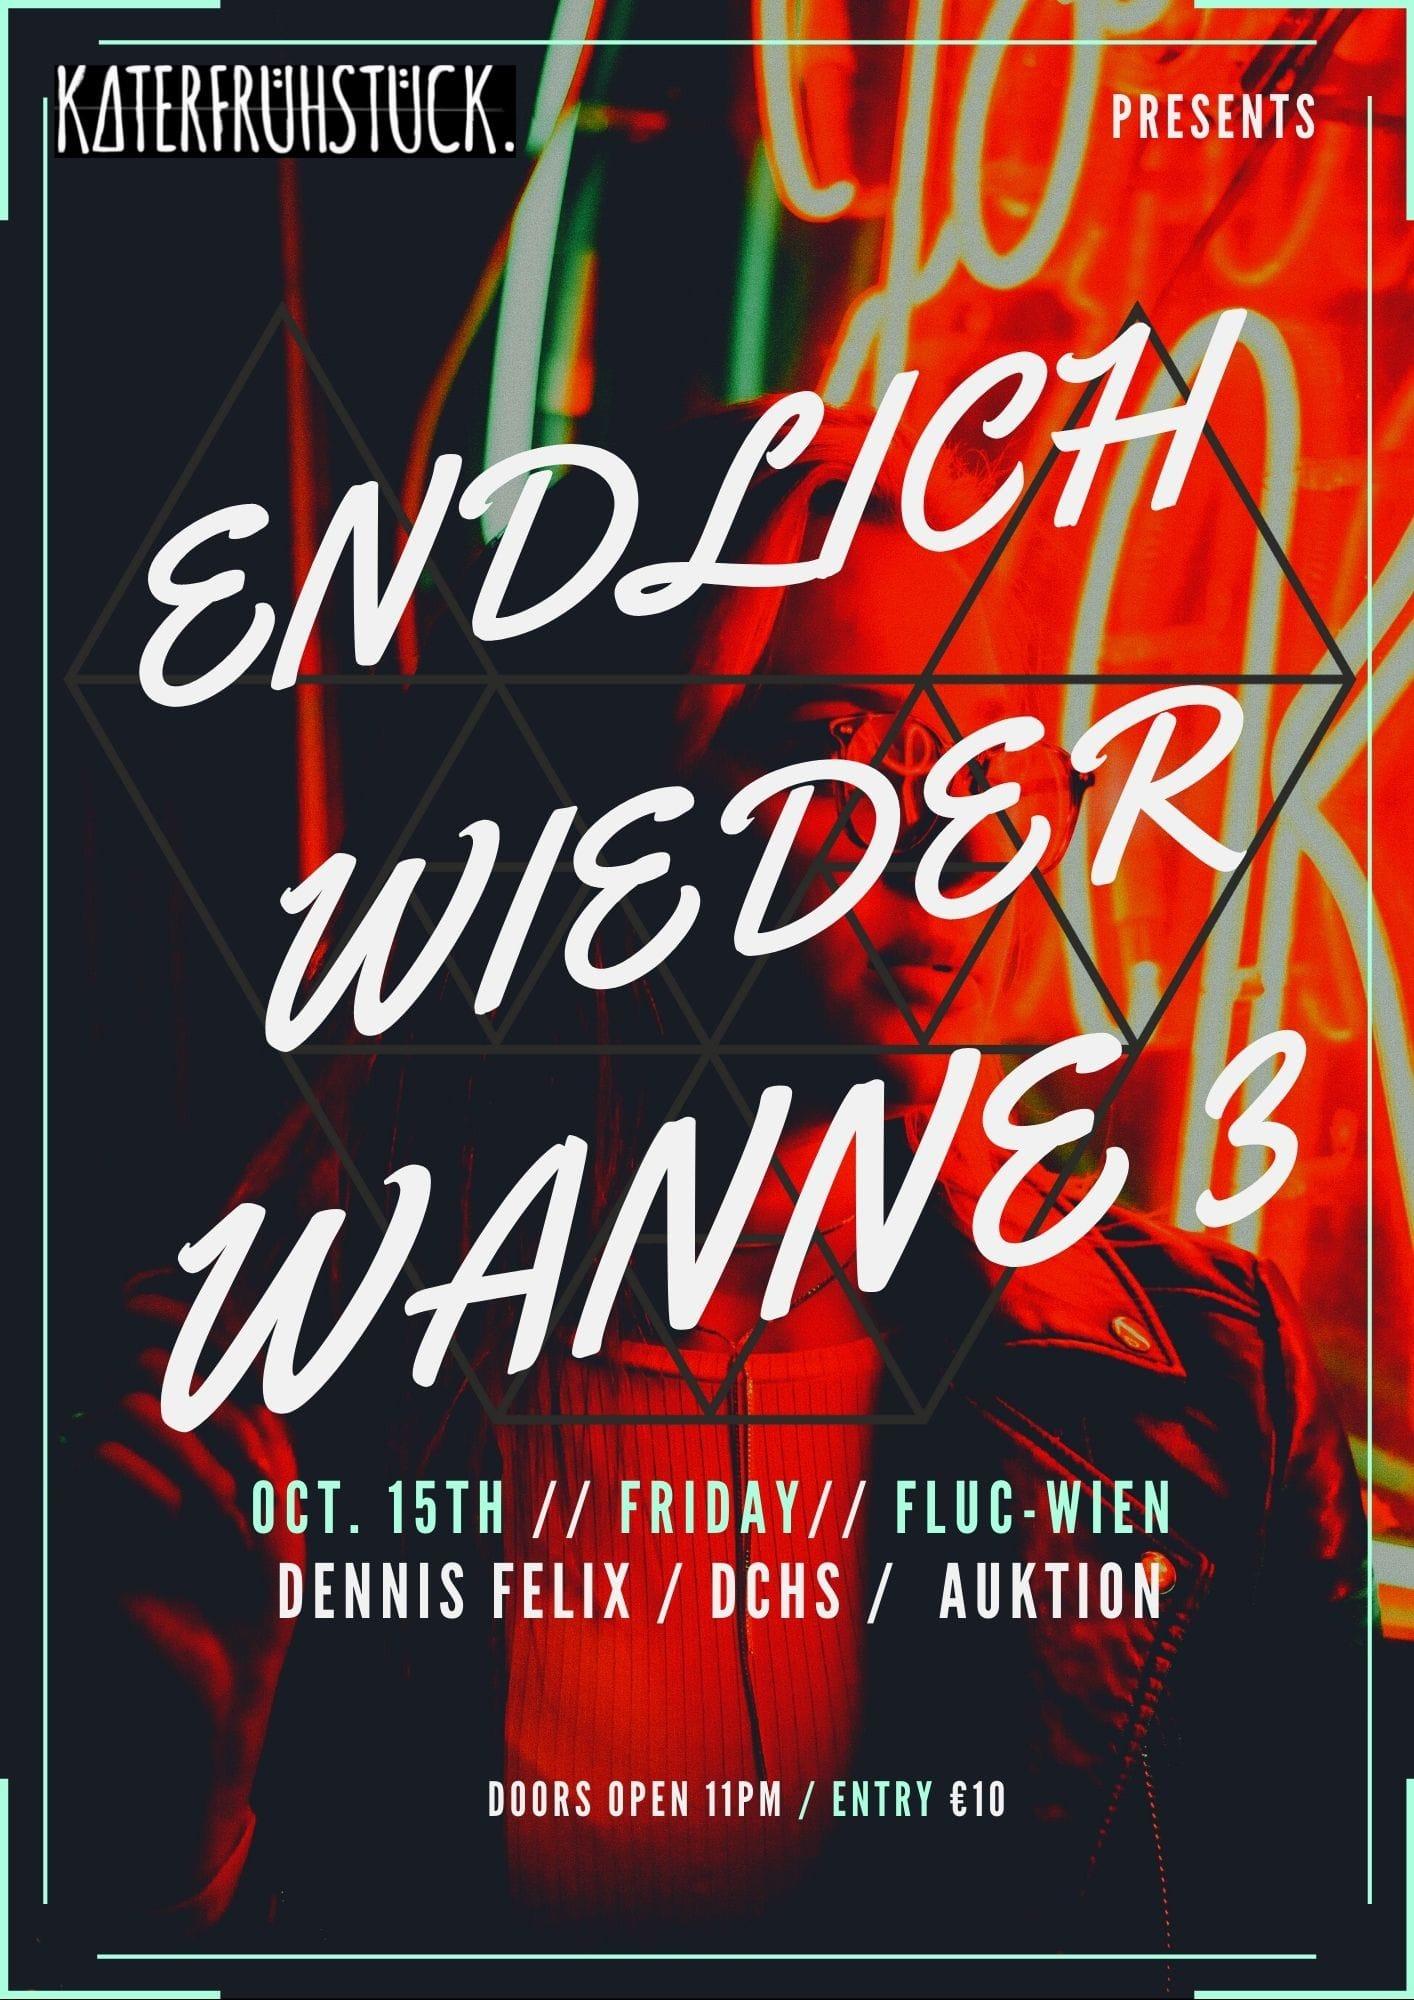 Events Wien: Endlich wieder Wanne III